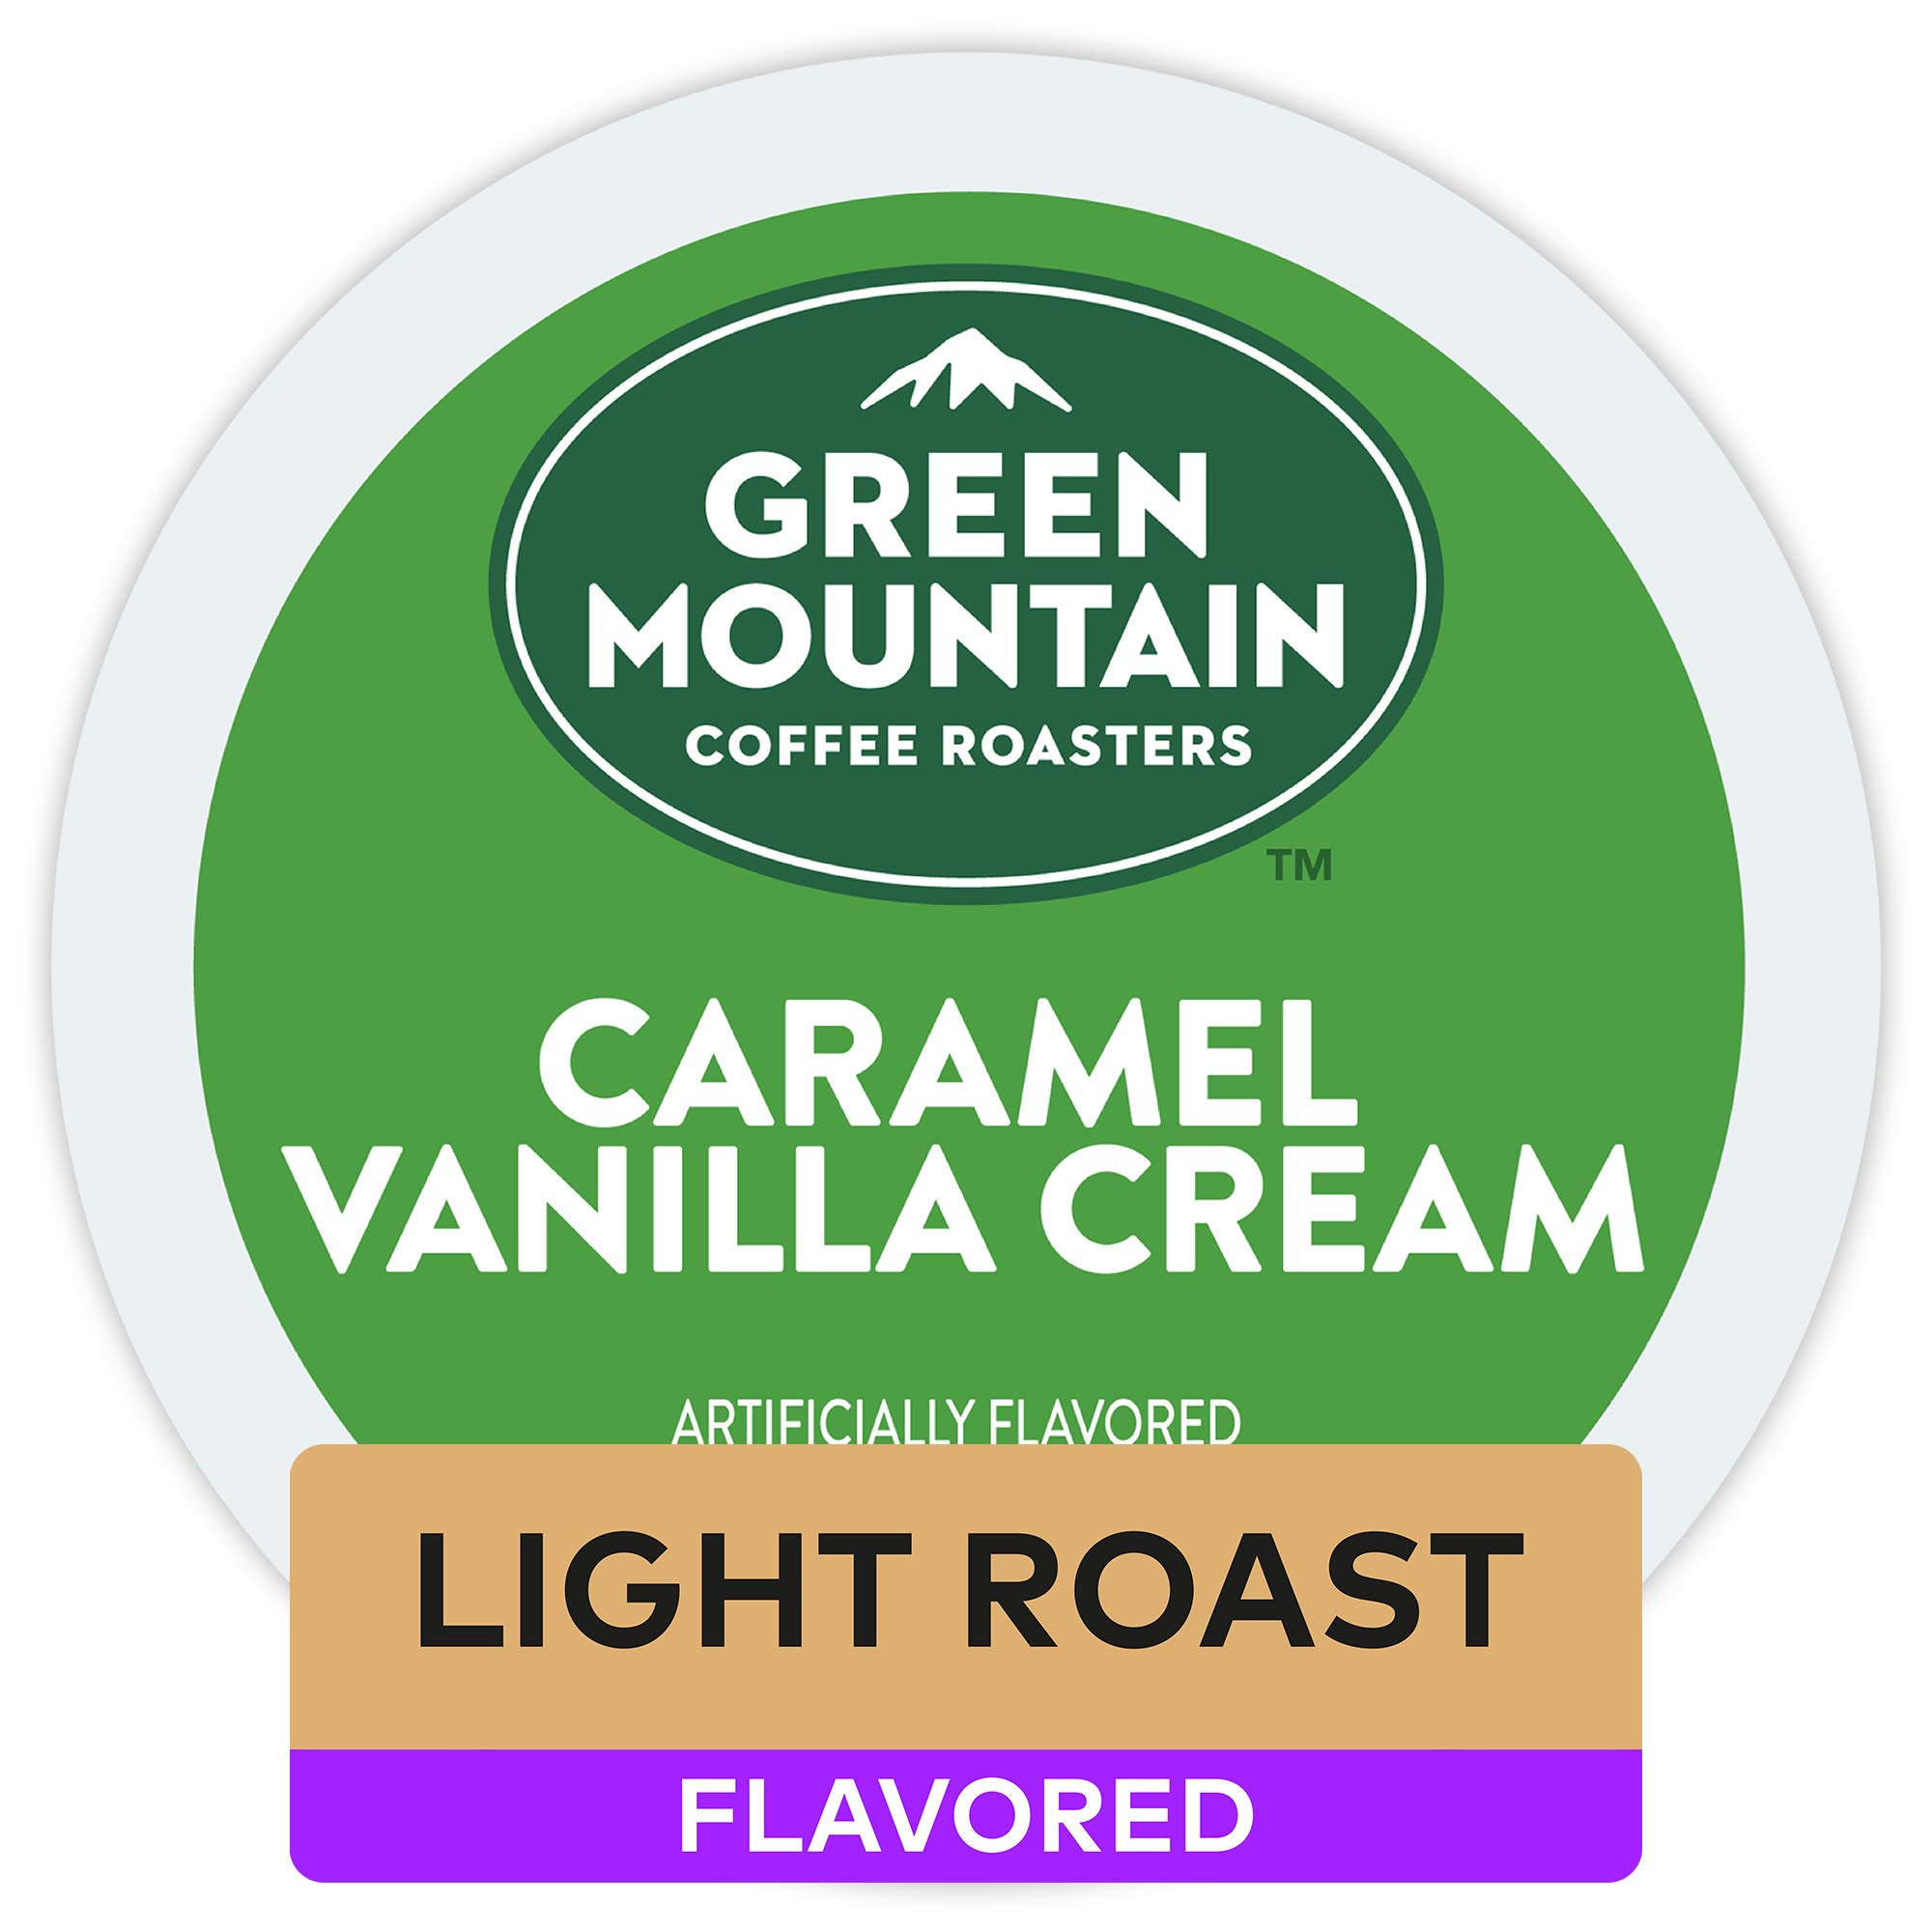 Green Mountain Coffee Roasters Caramel Vanilla Cream, Single Serve Coffee K-Cup Pod, Flavored Coffee, 12 count (Pack of 6) by GREEN MOUNTAIN COFFEE ROASTERS